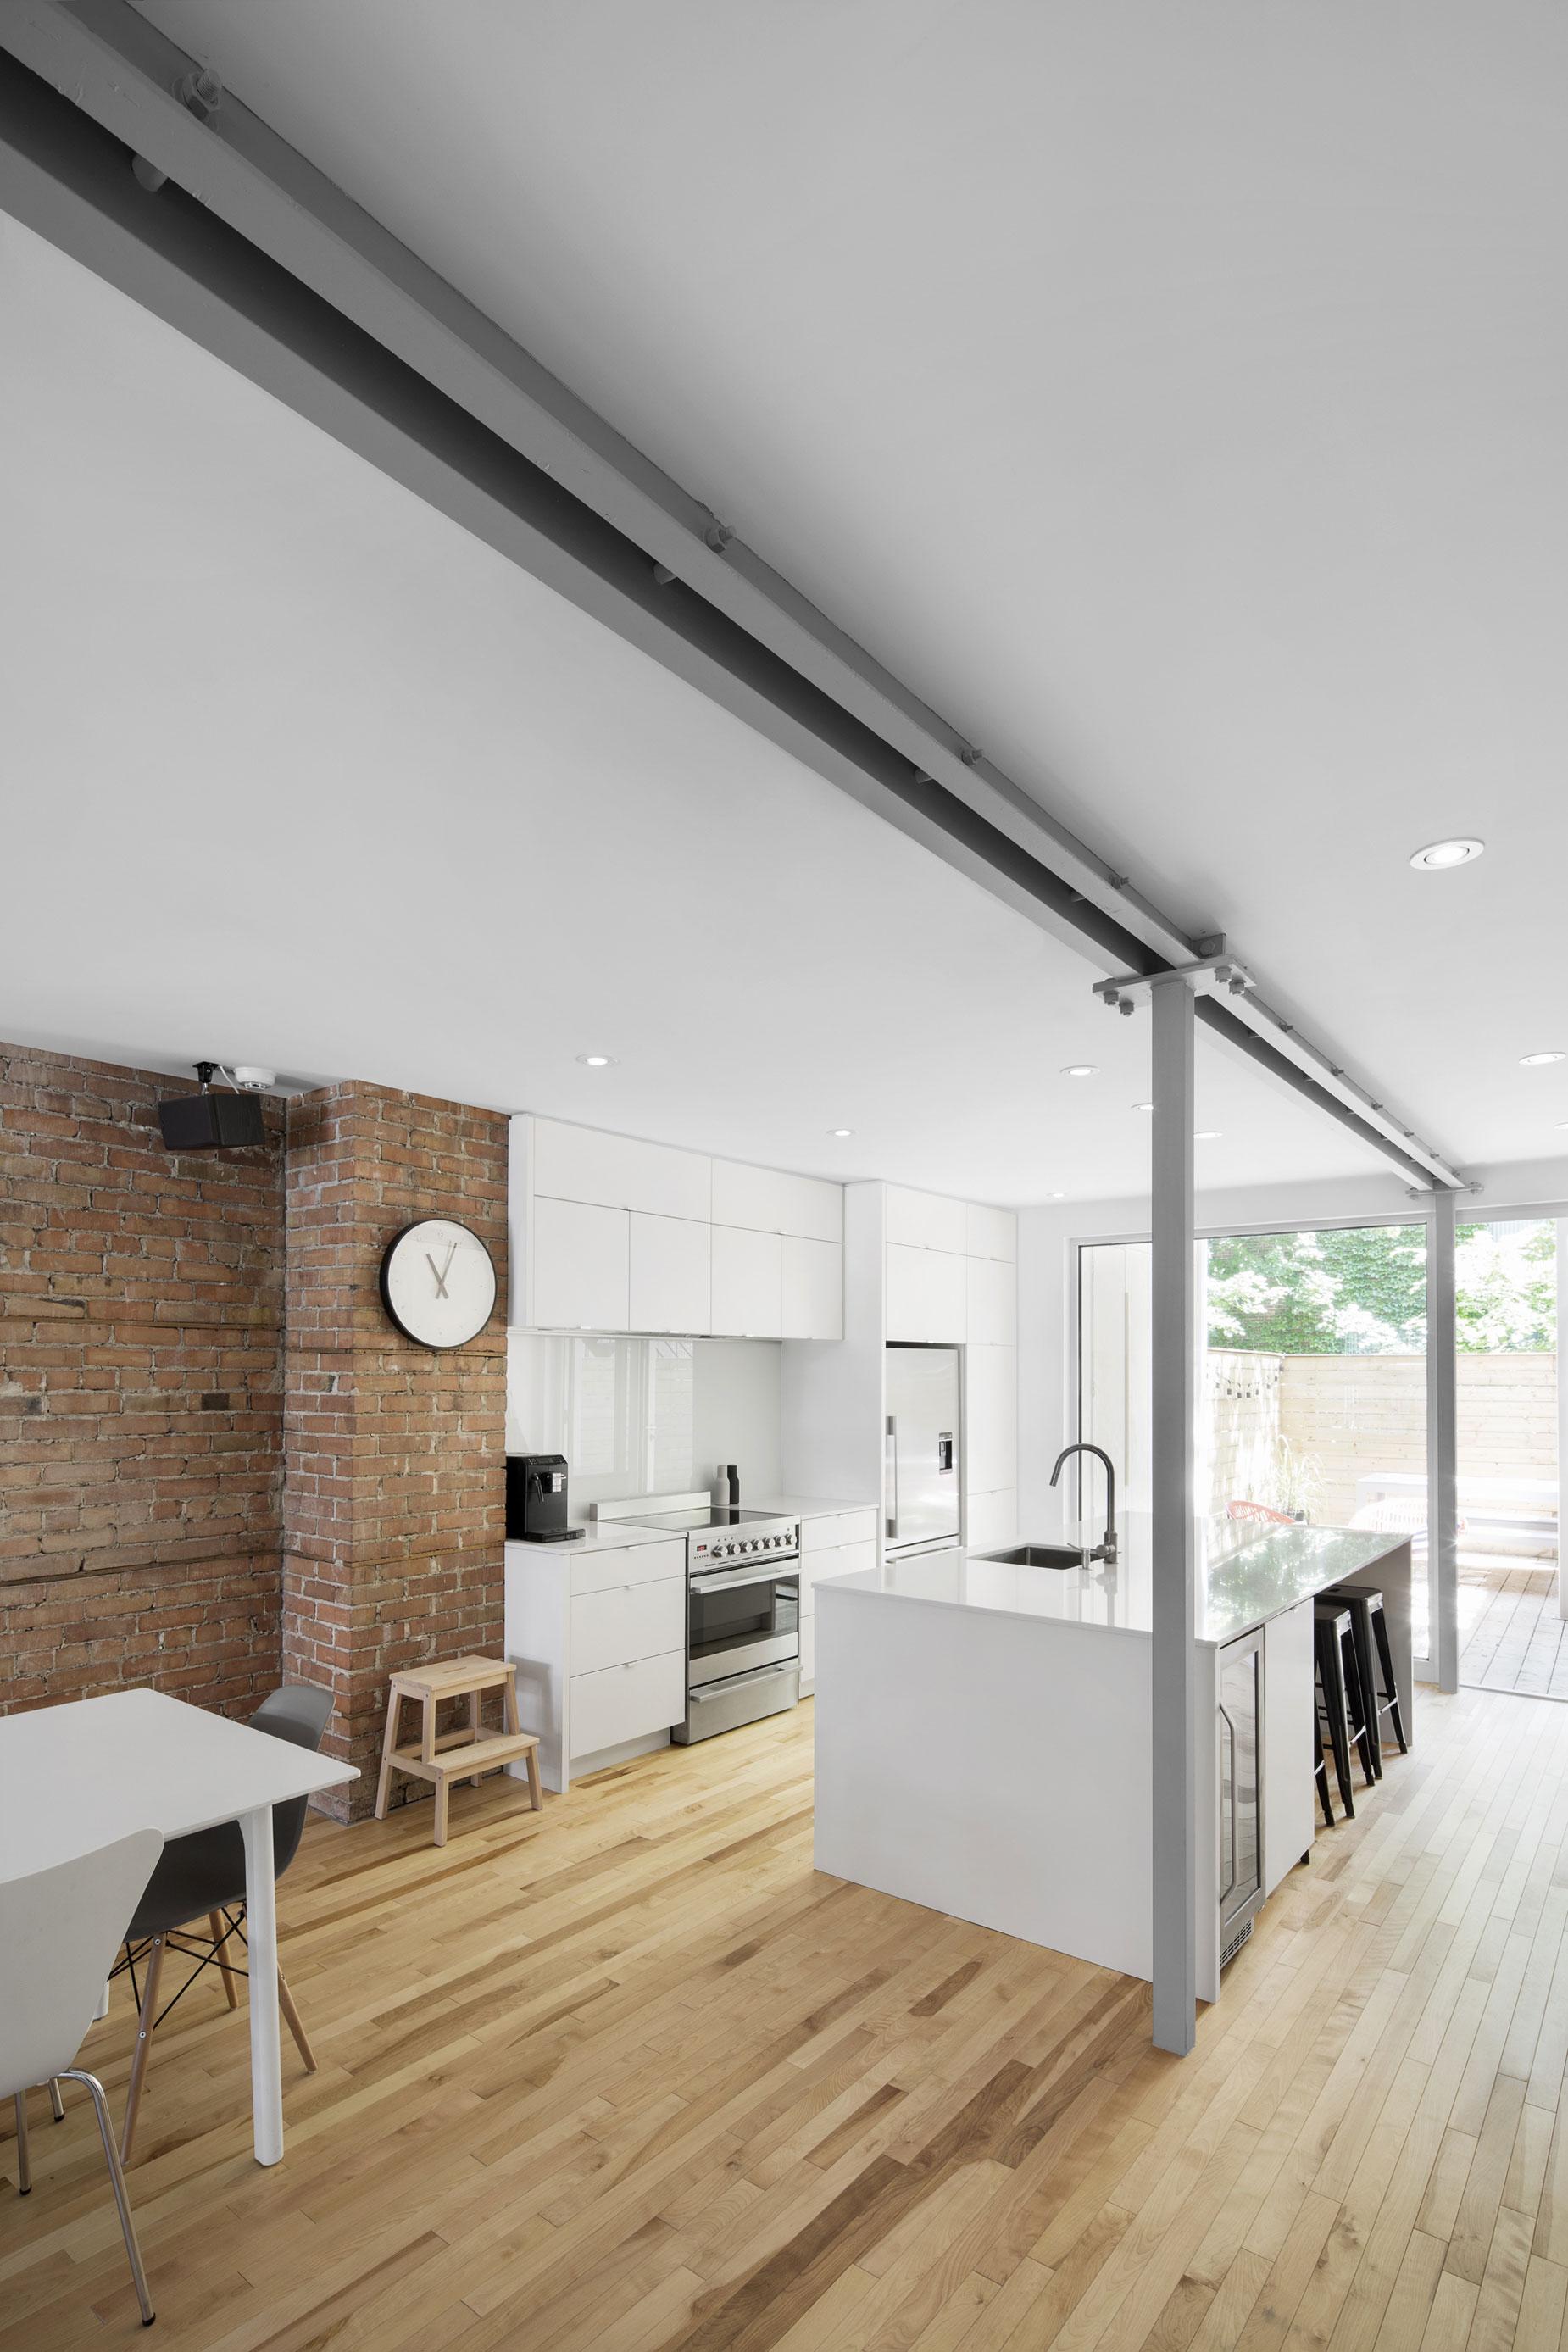 867 De Bougainville Apartment by Bourgeois:Lechasseur architects-03